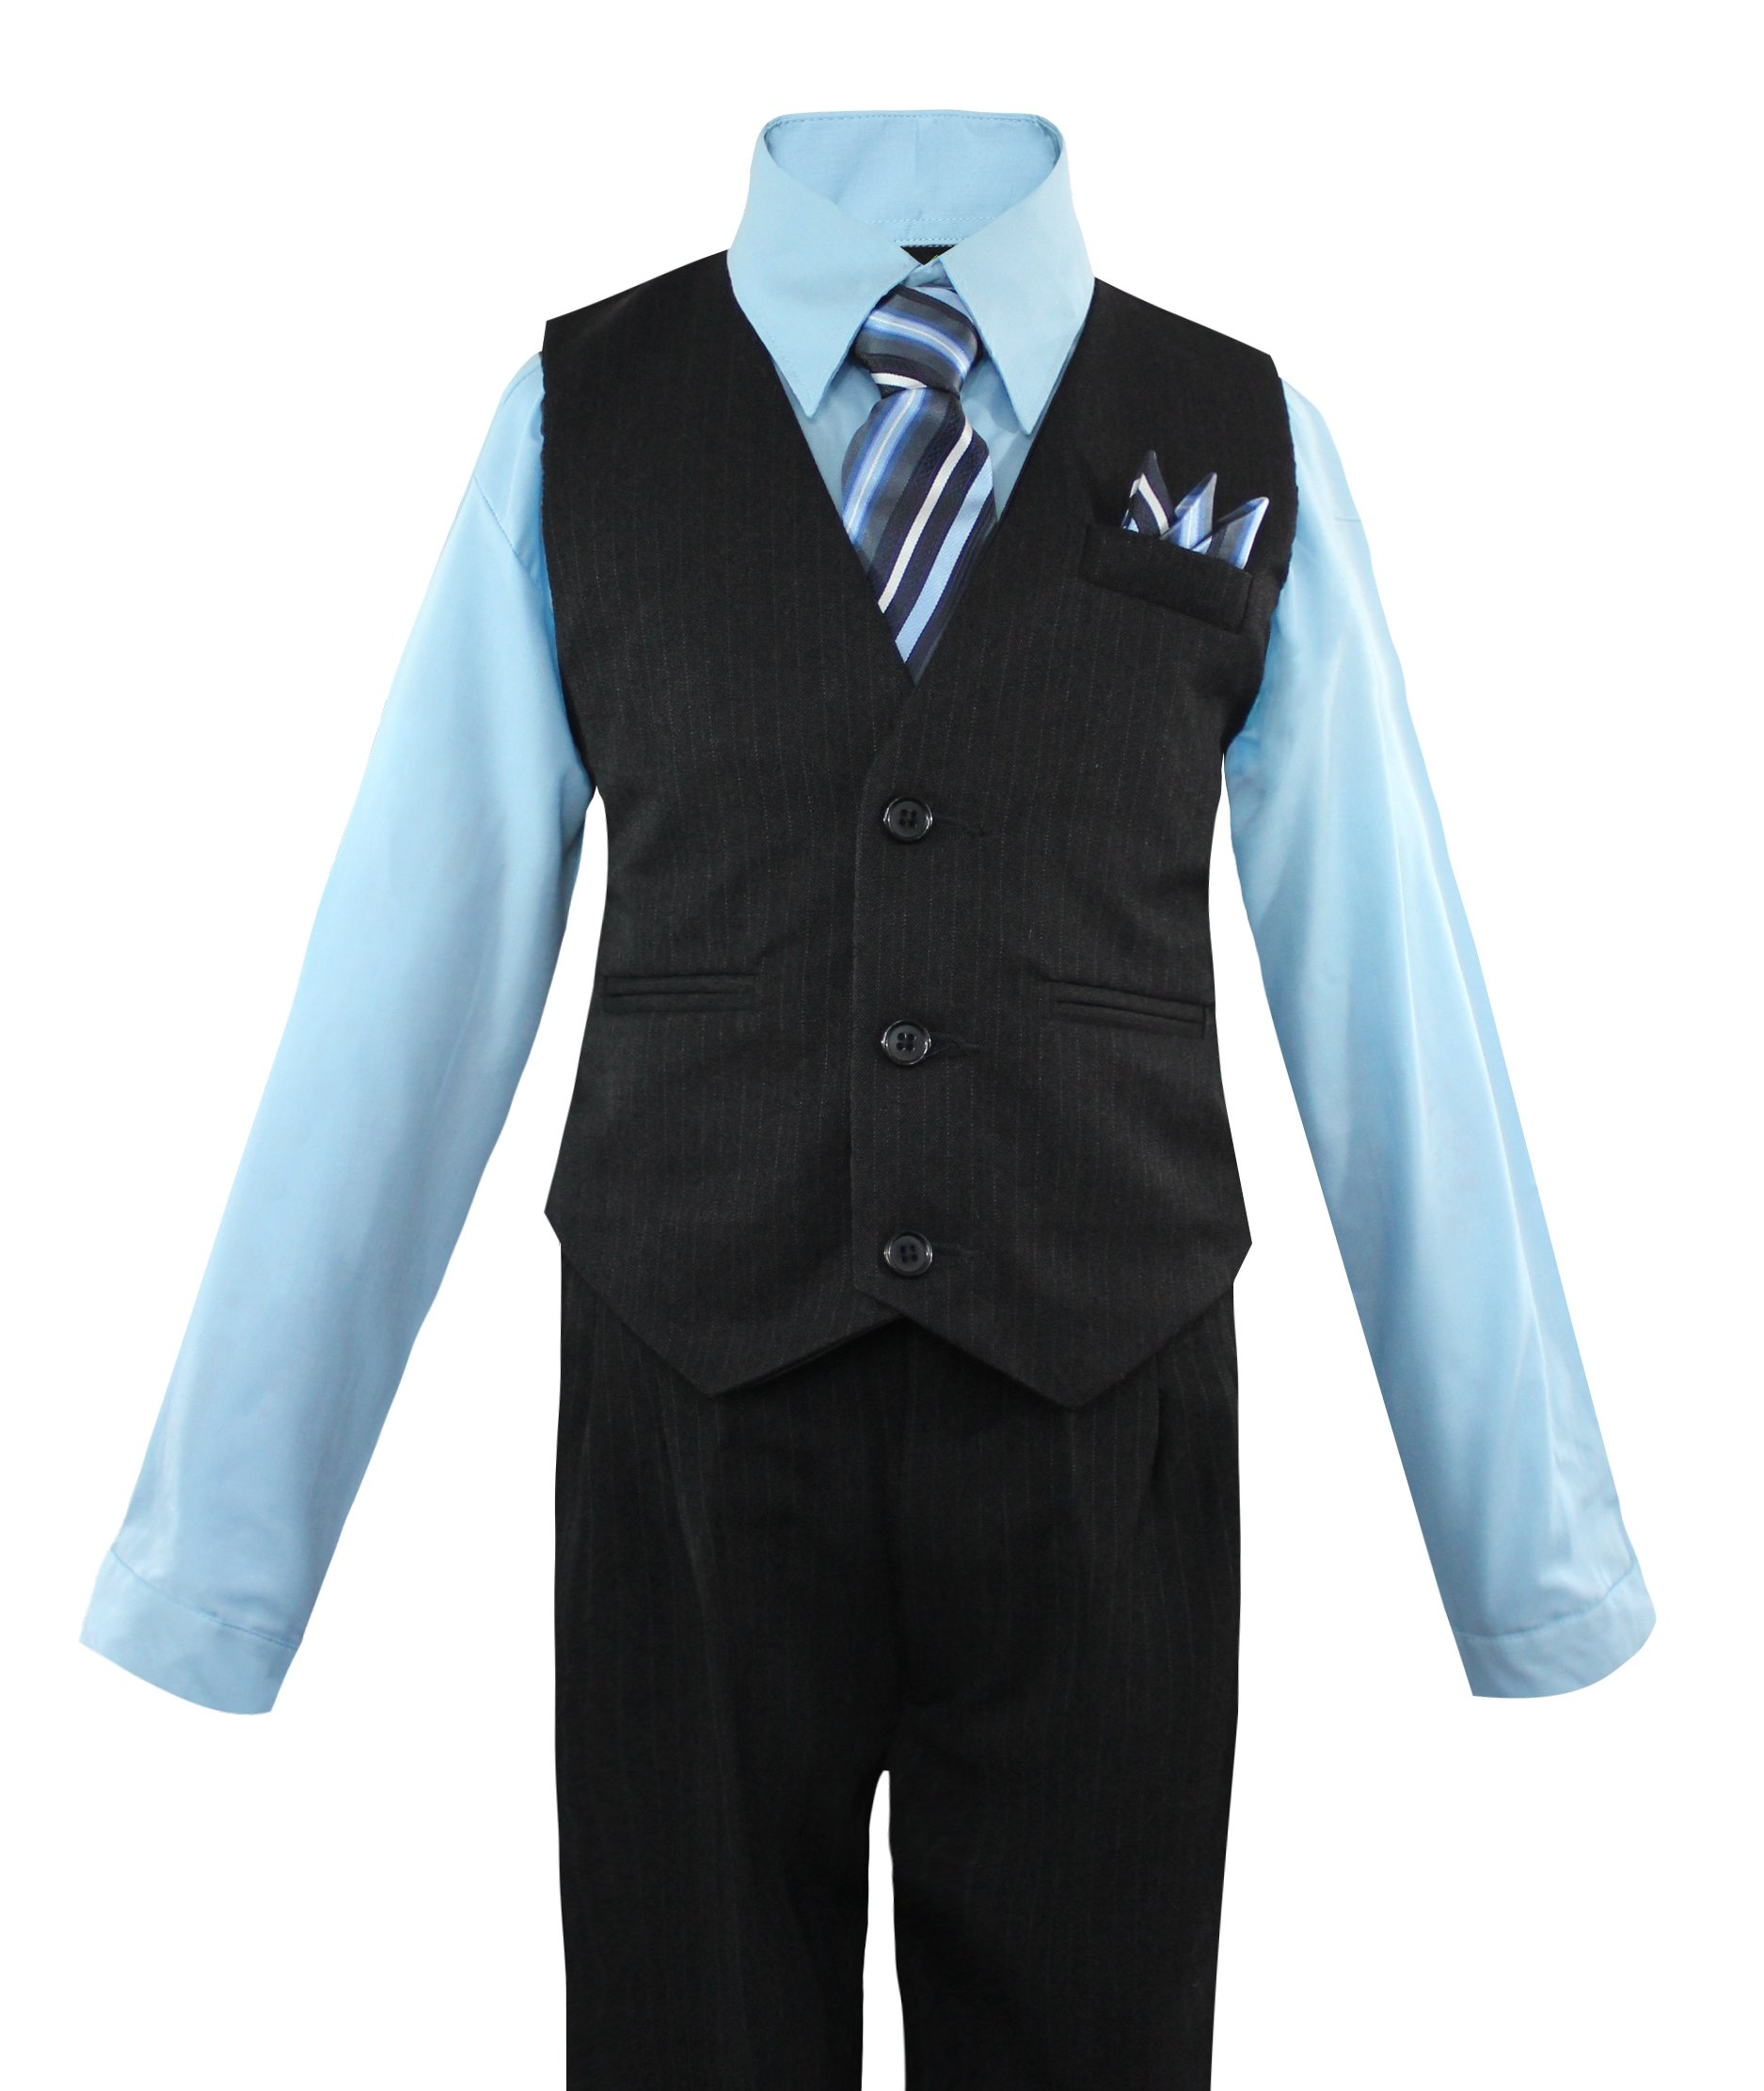 Luca Gabriel Toddler Boys' 4 Piece Pinstripe Vest Shirt Tie Pant and Hanky Set Sky Blue - 12